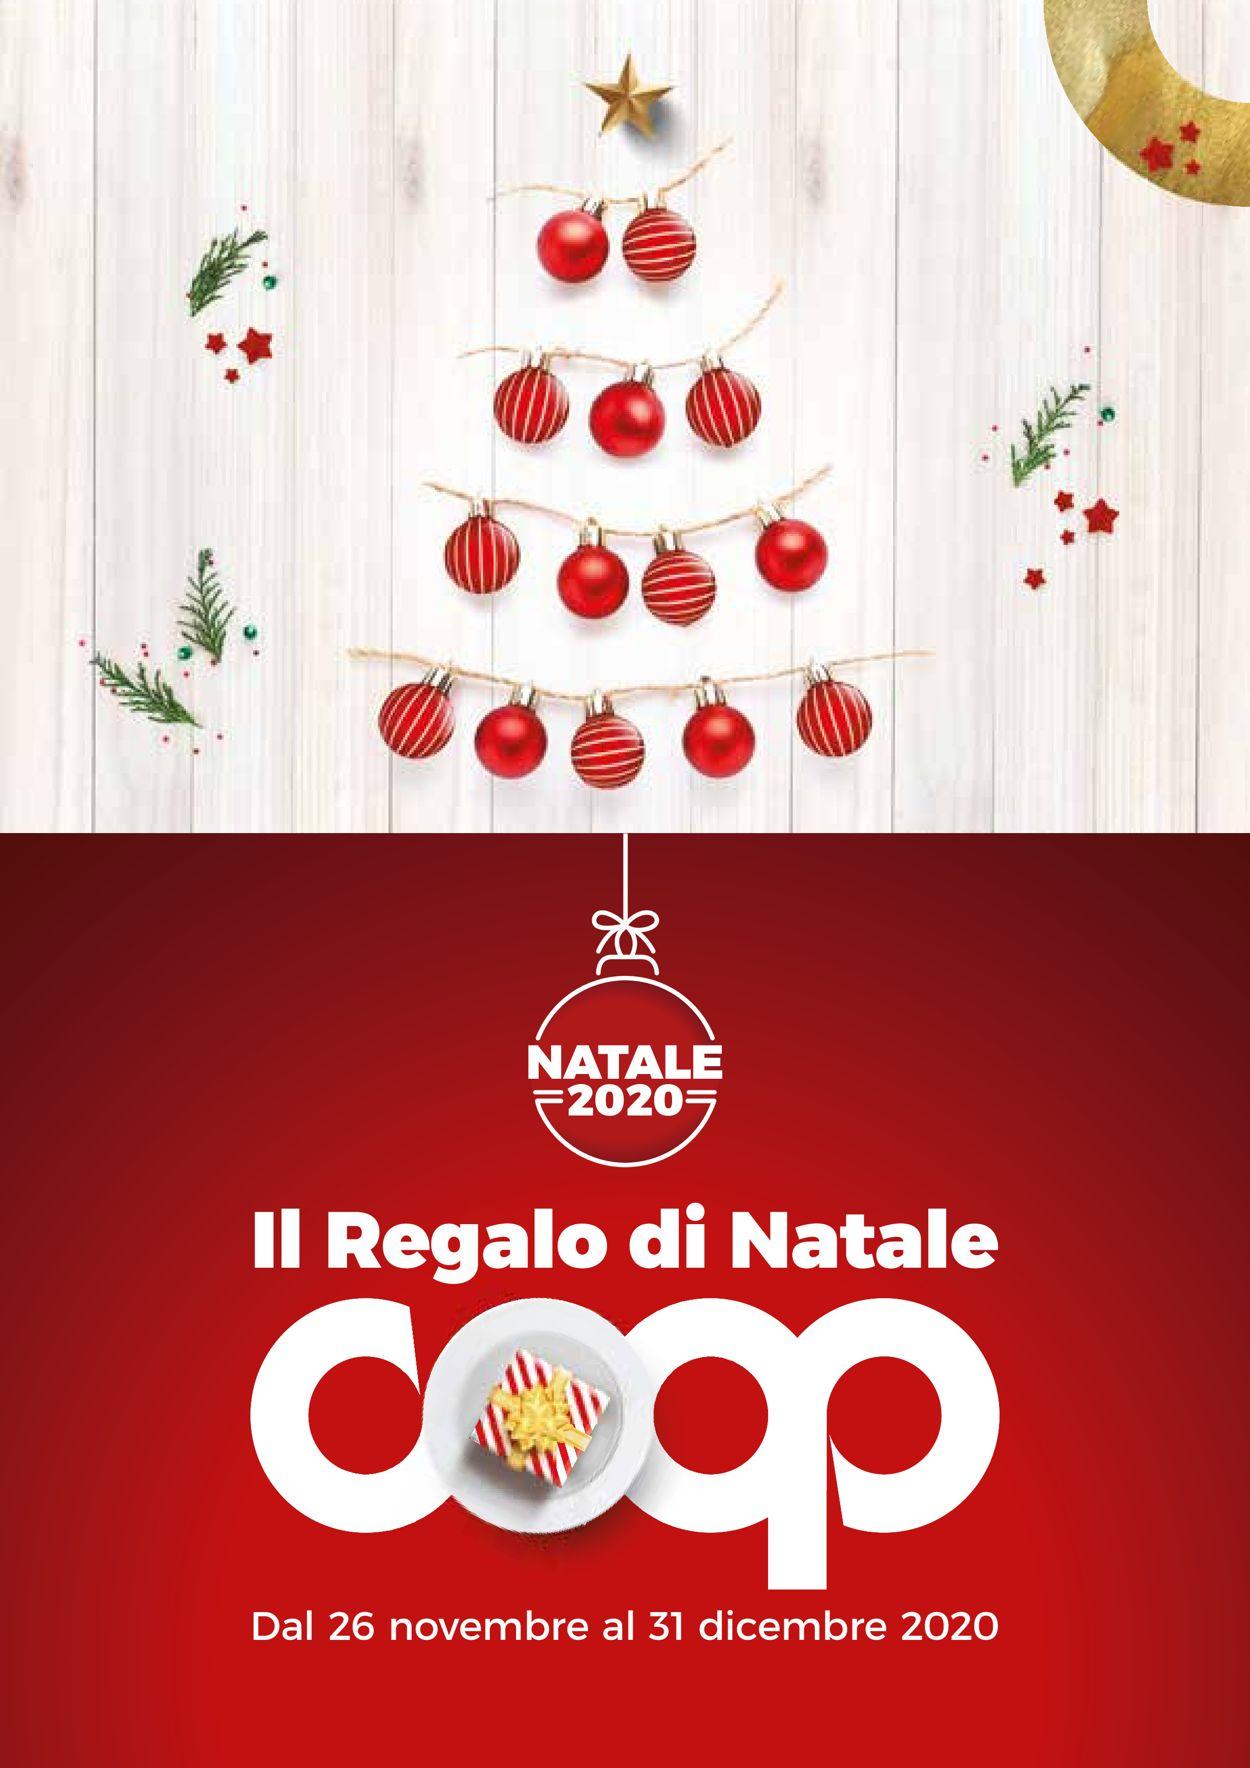 Volantino Coop - Natale 2020 - Offerte 26/11-31/12/2020